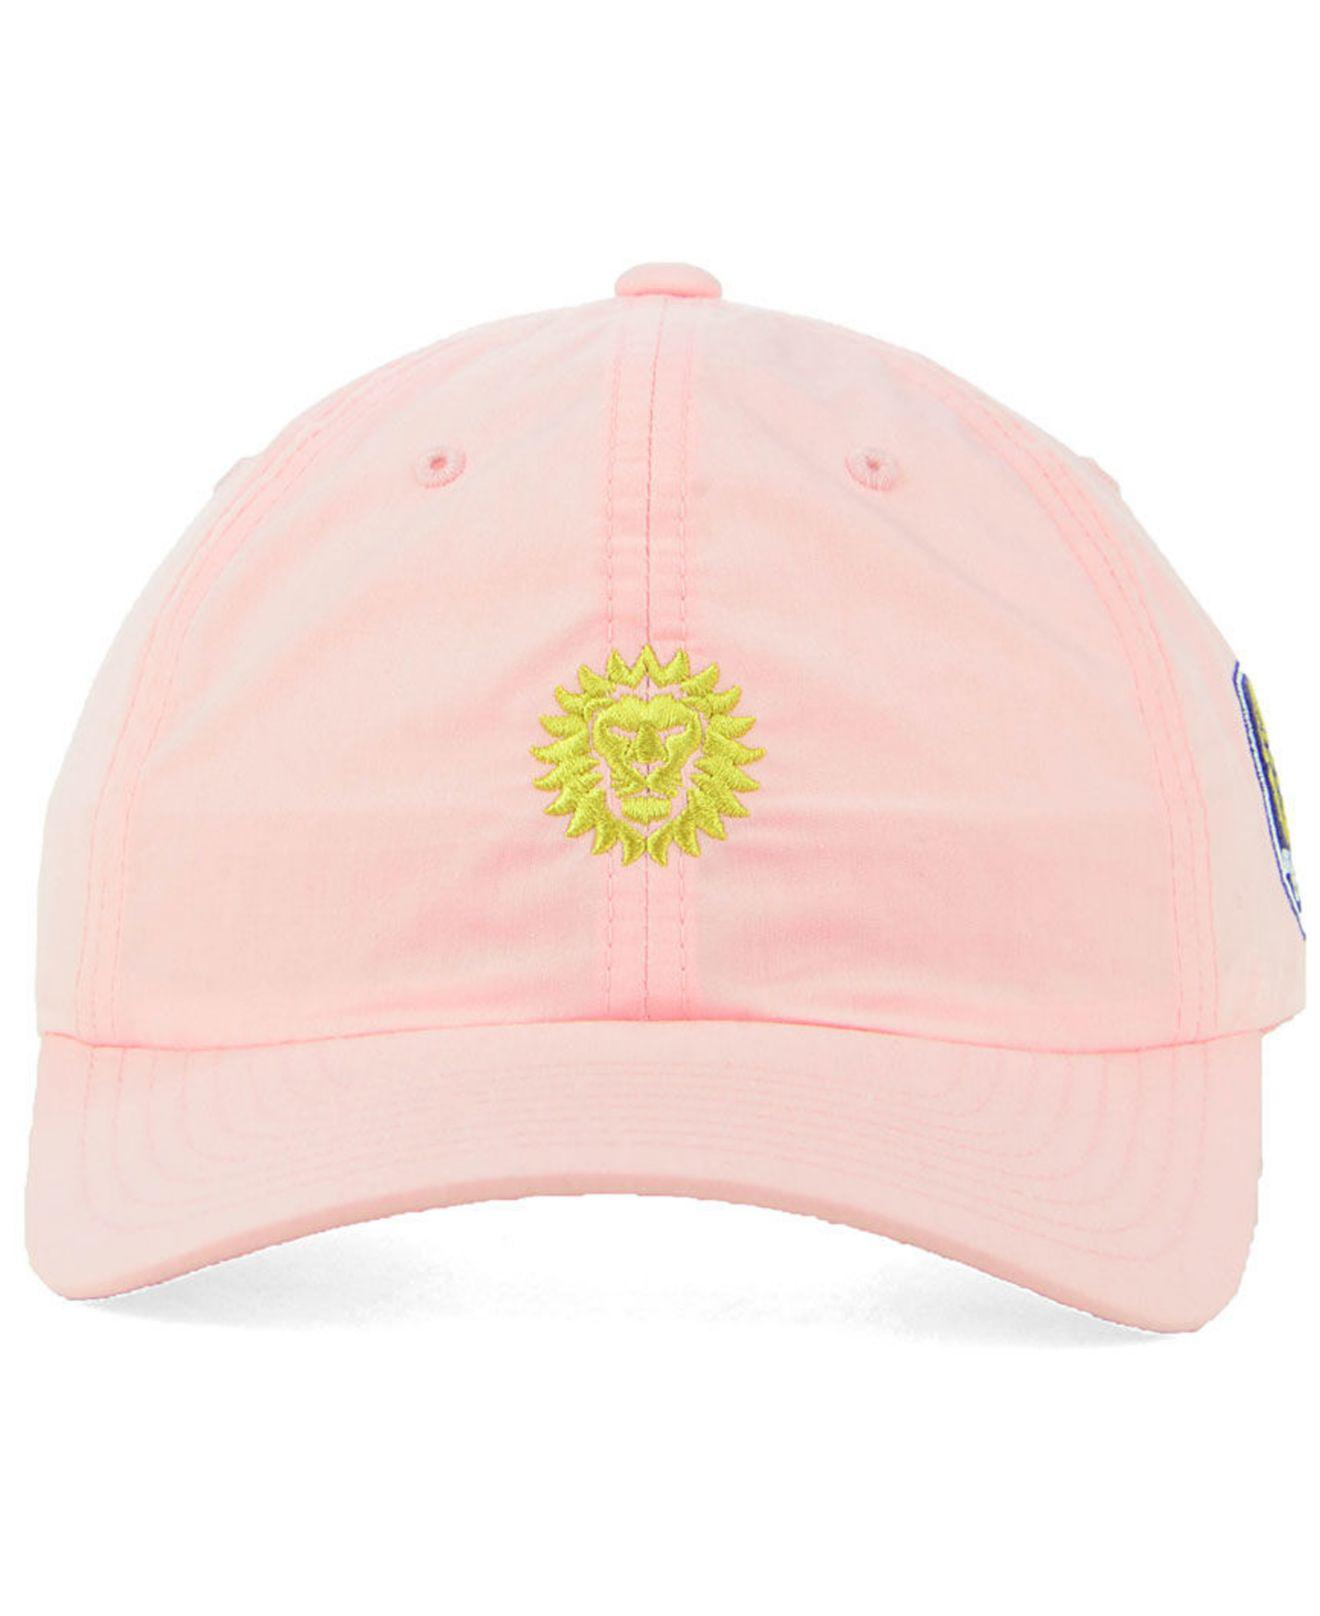 b7da7e9f9c2 ... shop lyst adidas orlando city sc pink easy adjustable cap in pink 51513  0e31f